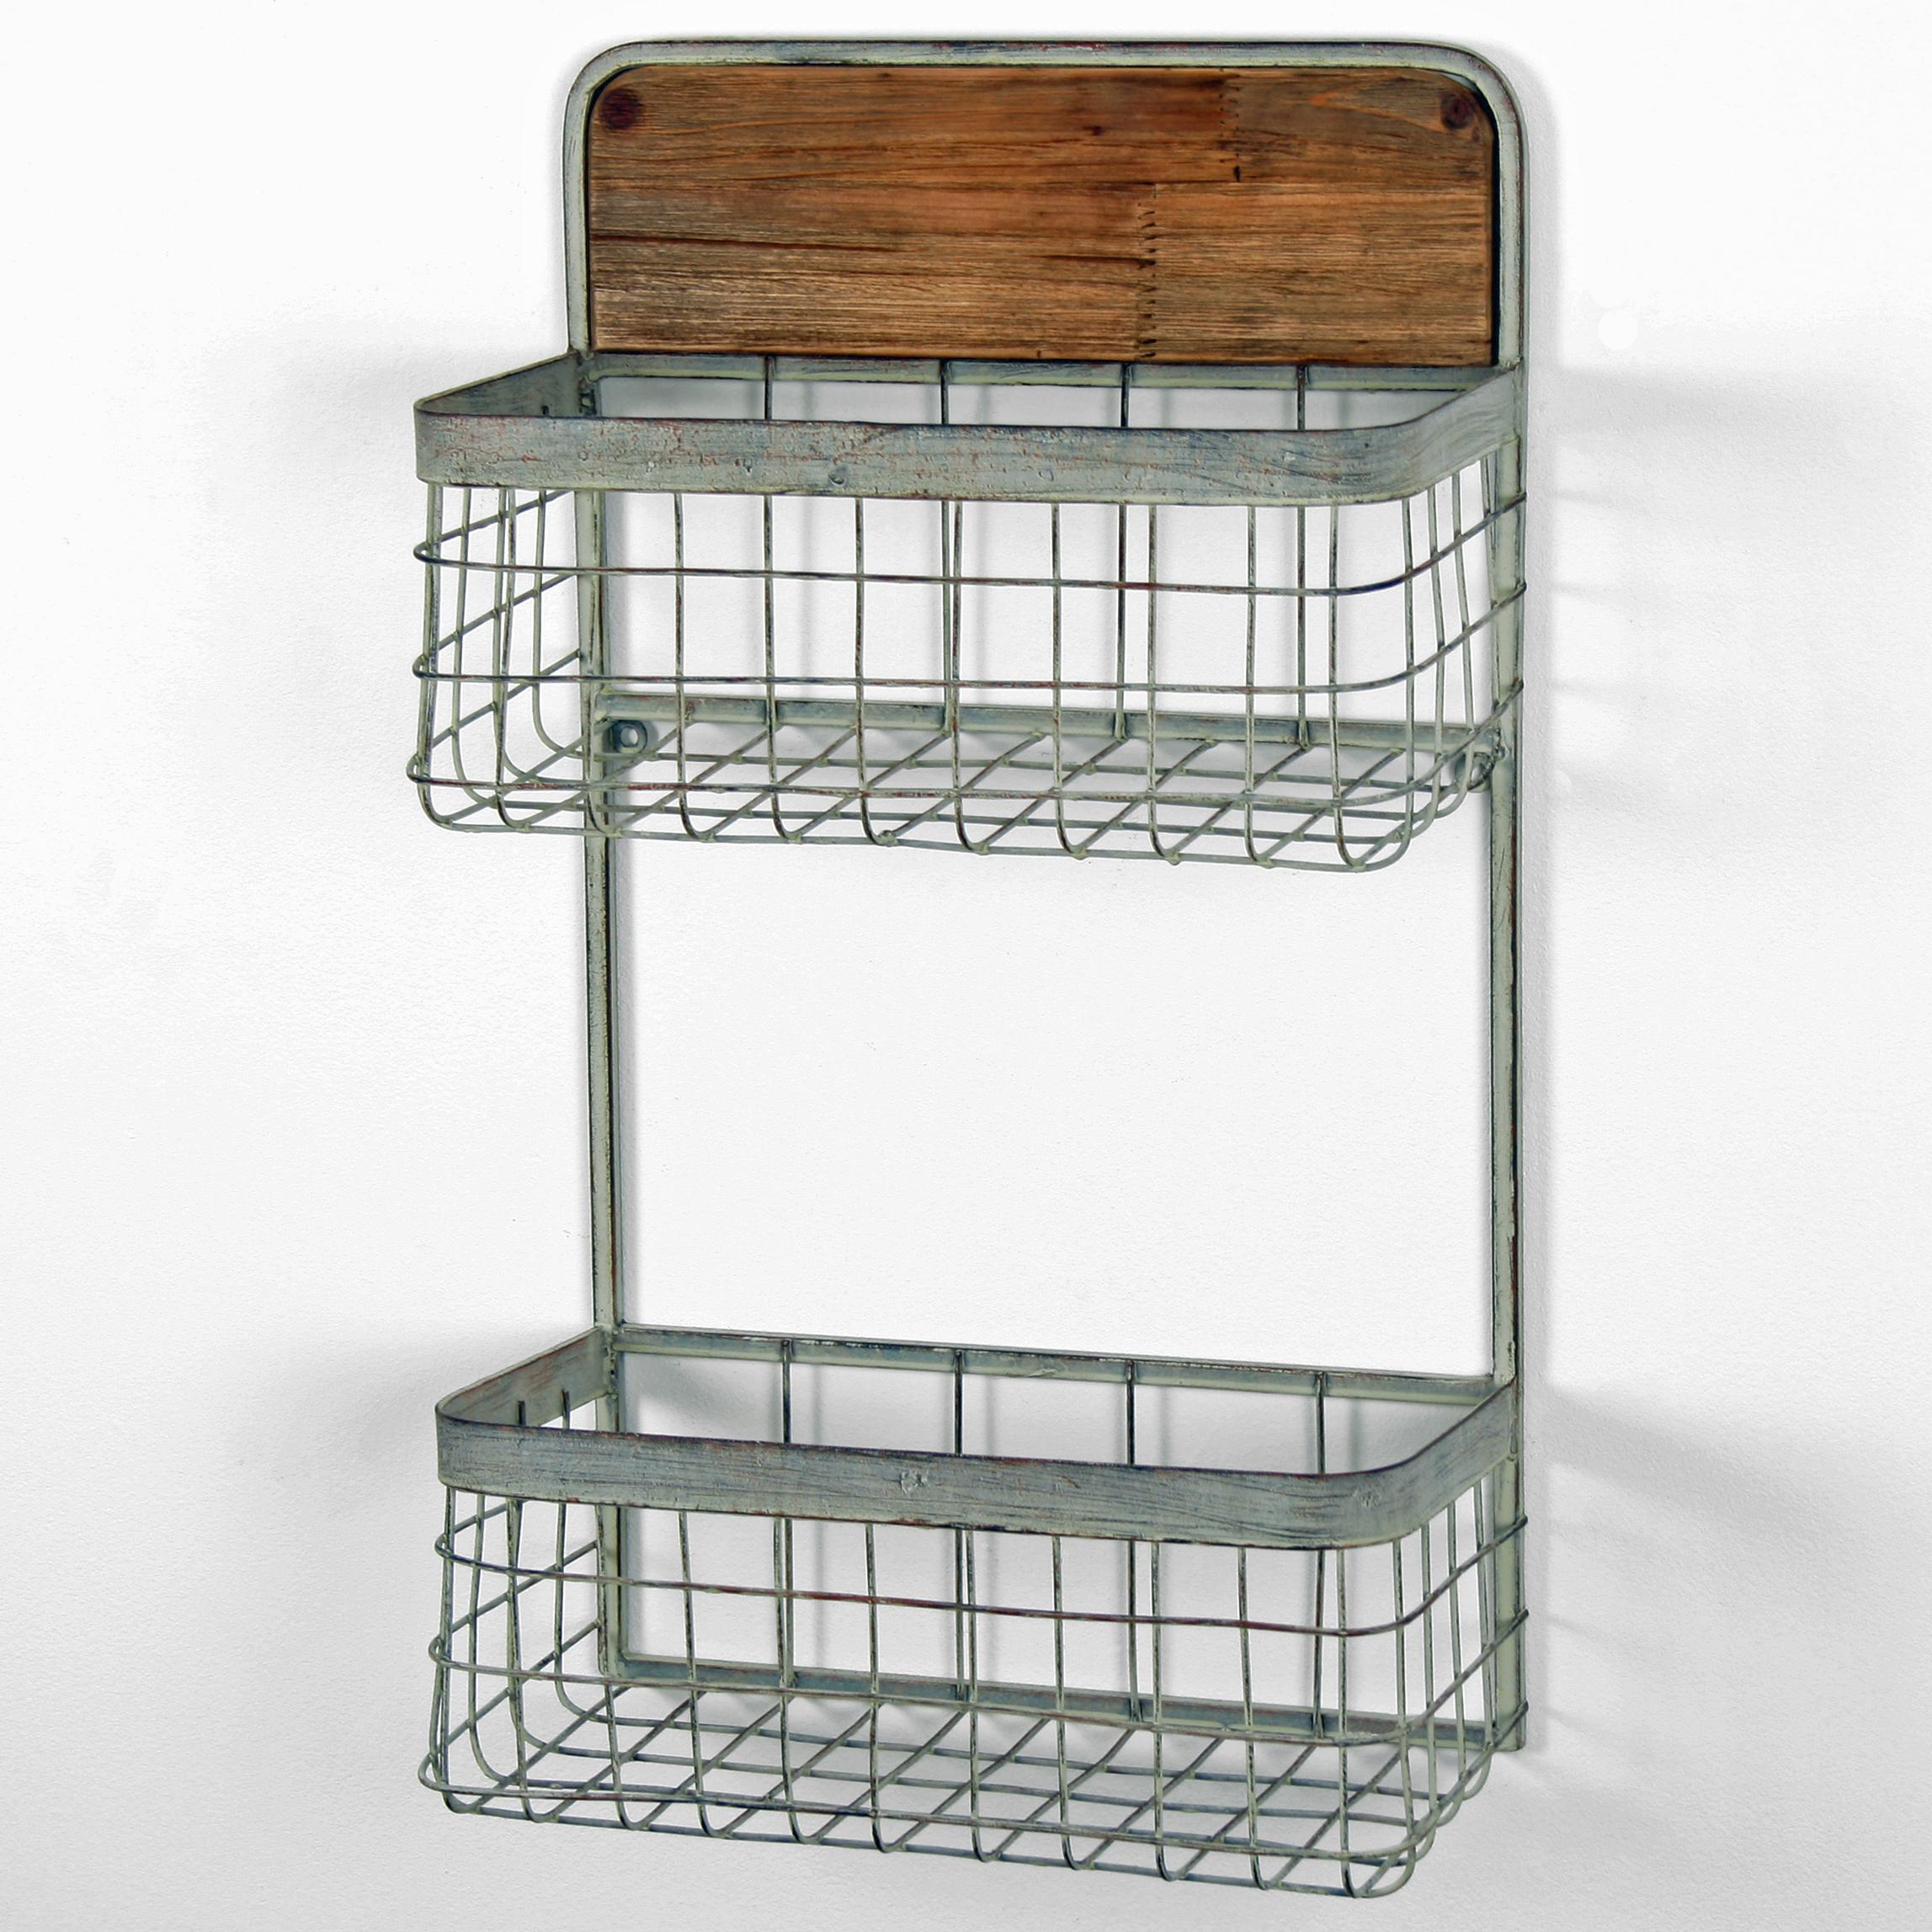 Metal Wall Mounted Double Hanging Basket Storage Shelves